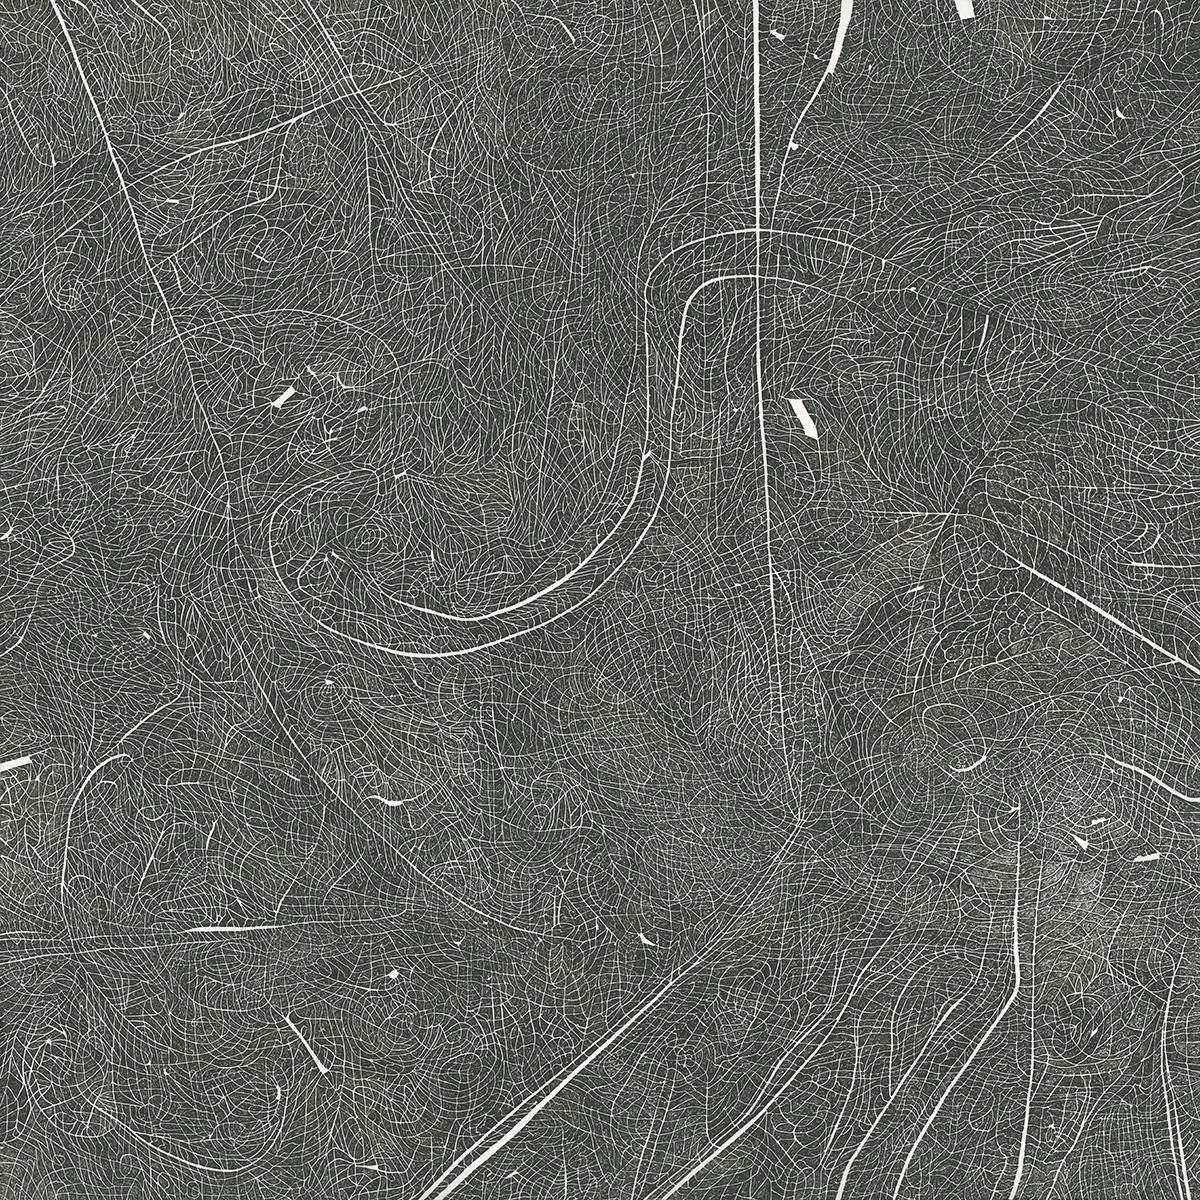 Al Denyer    Terrain   ink on paper, 30 x 30 in.